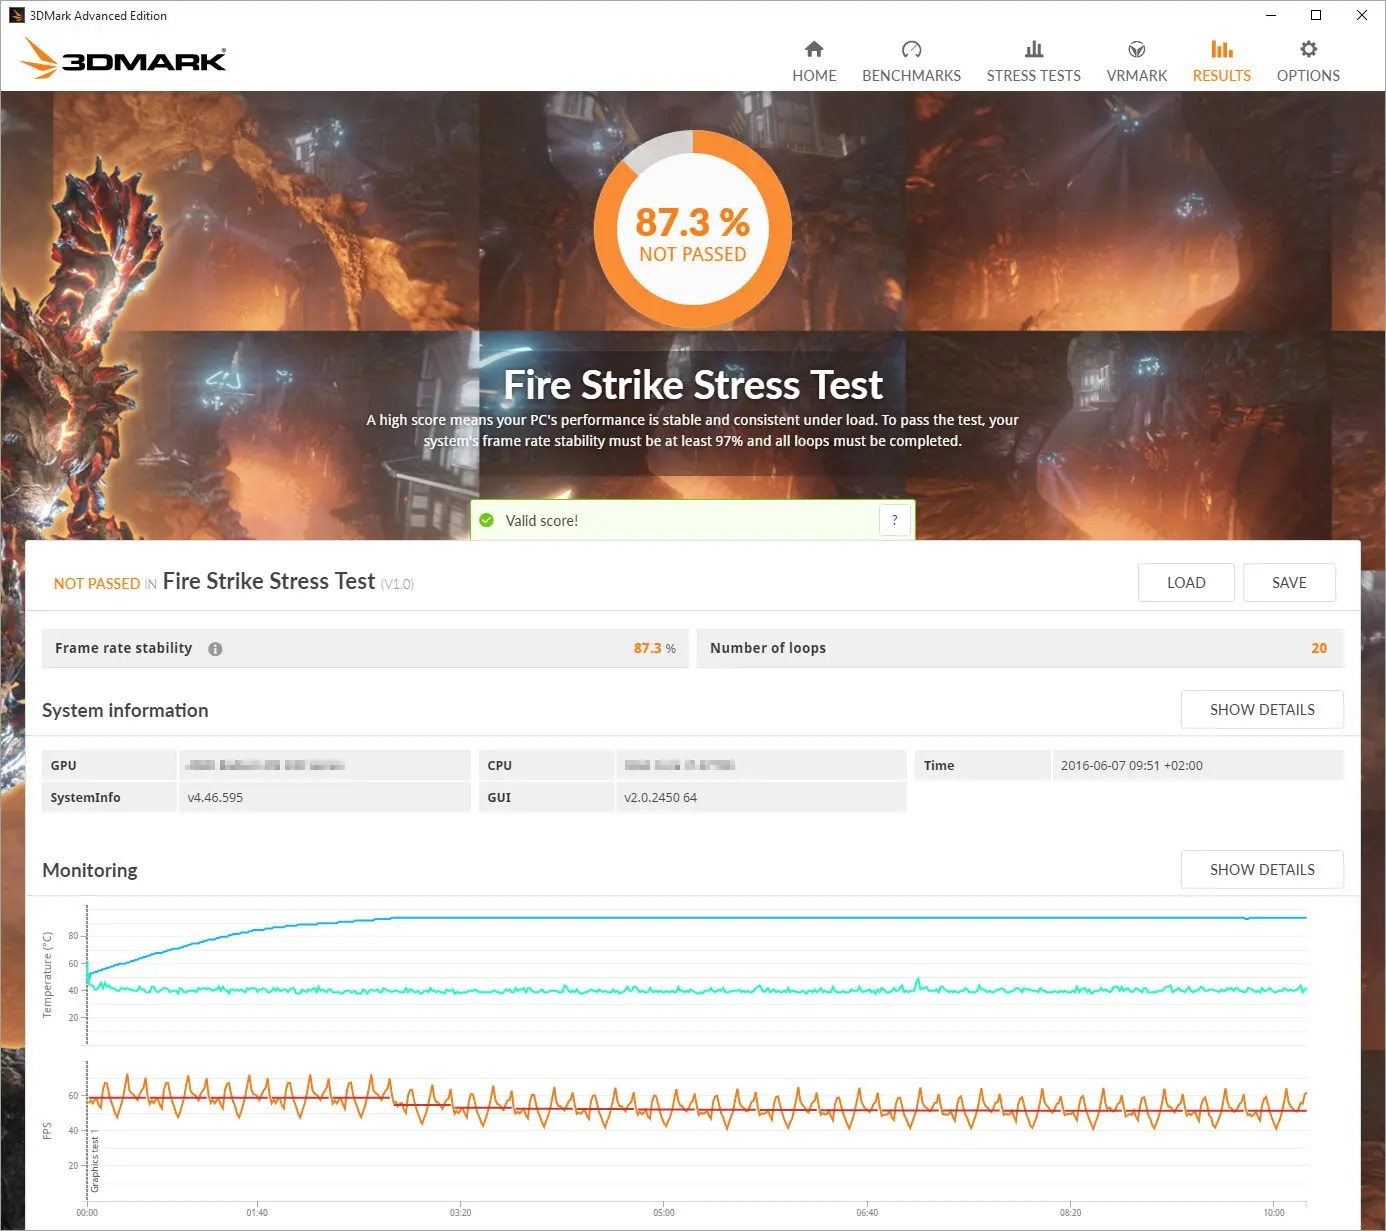 3dmark-stress-test-not-passed-result